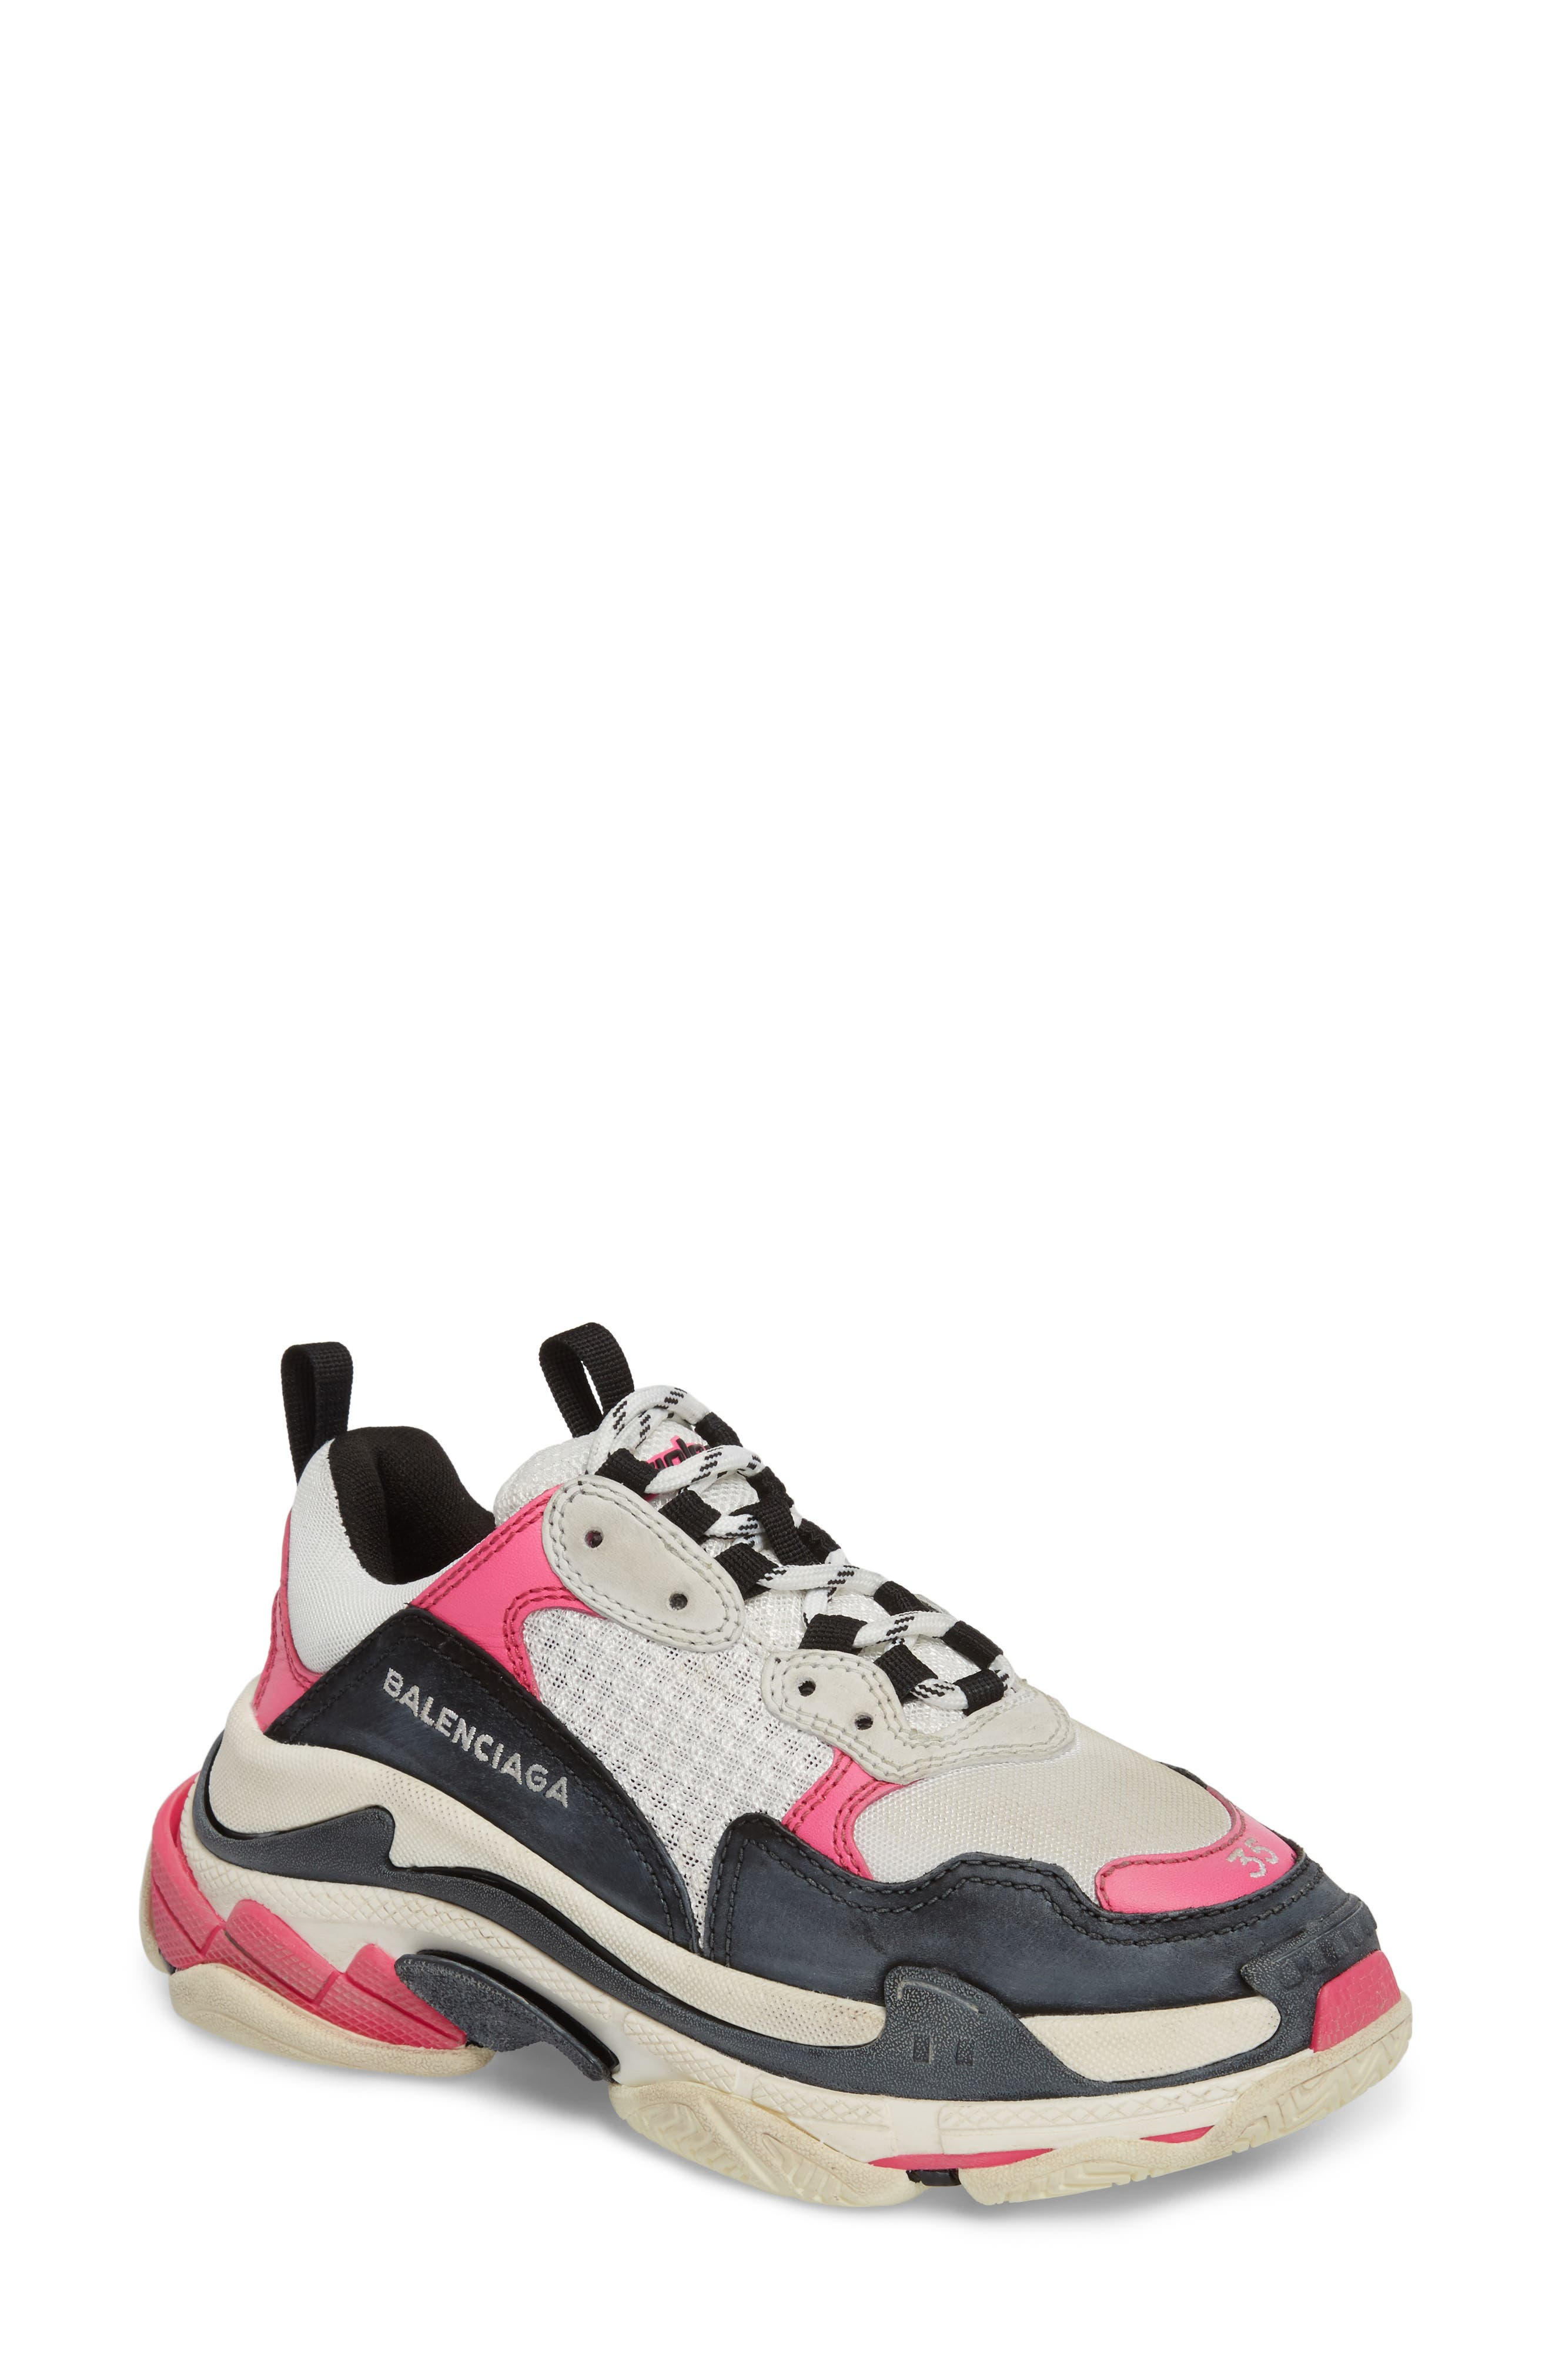 BALENCIAGA Triple S Low Top Sneaker, Main, color, WHITE/ BLACK/ PINK